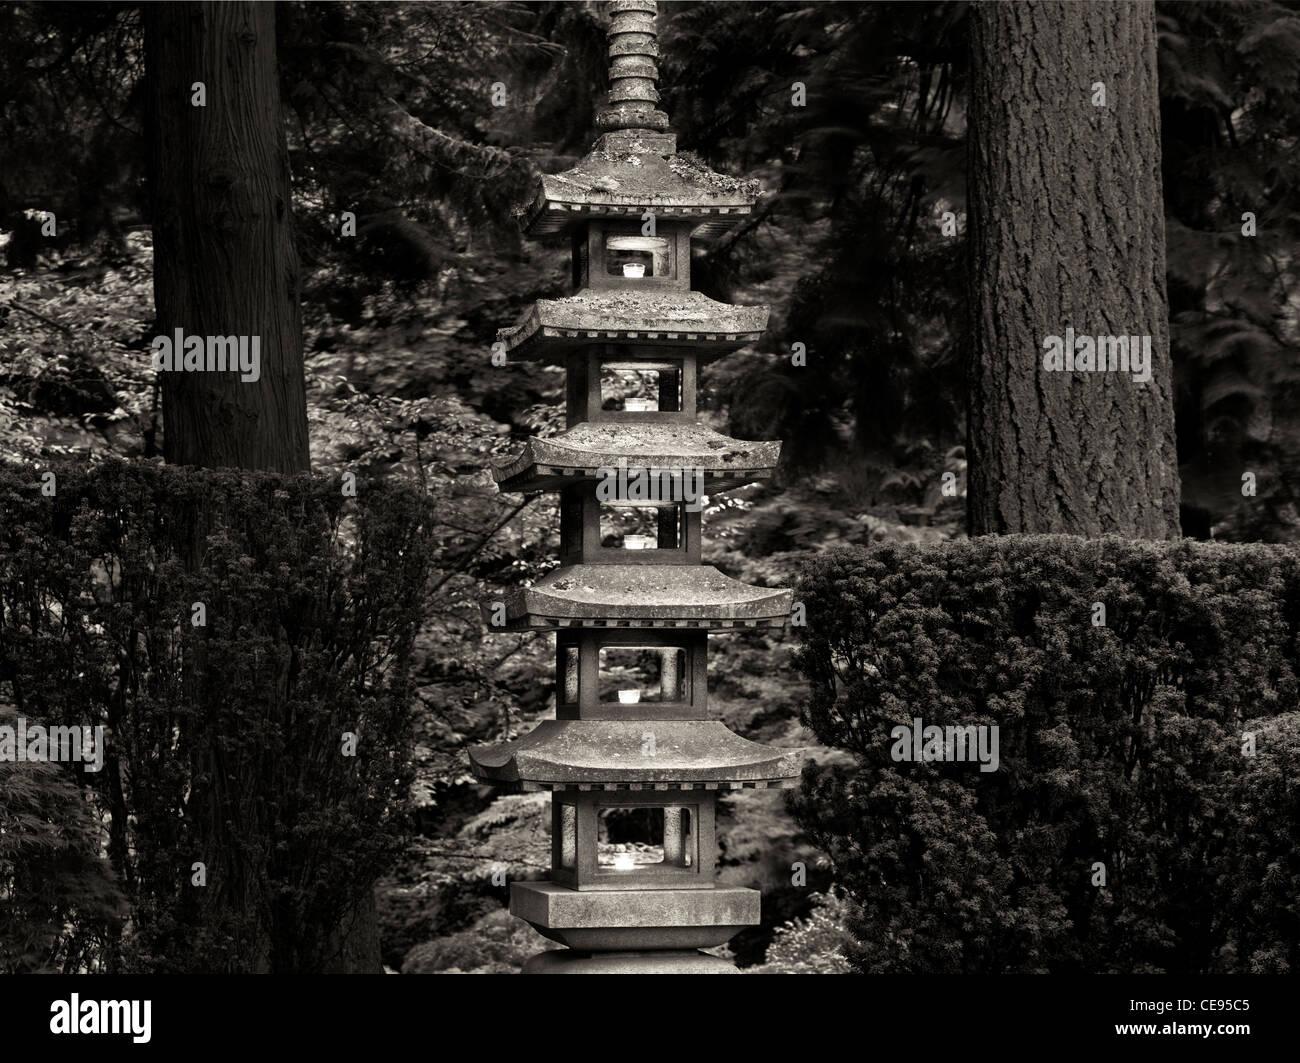 Lit lanterns in Portland Japanese Gardens. Oregon - Stock Image